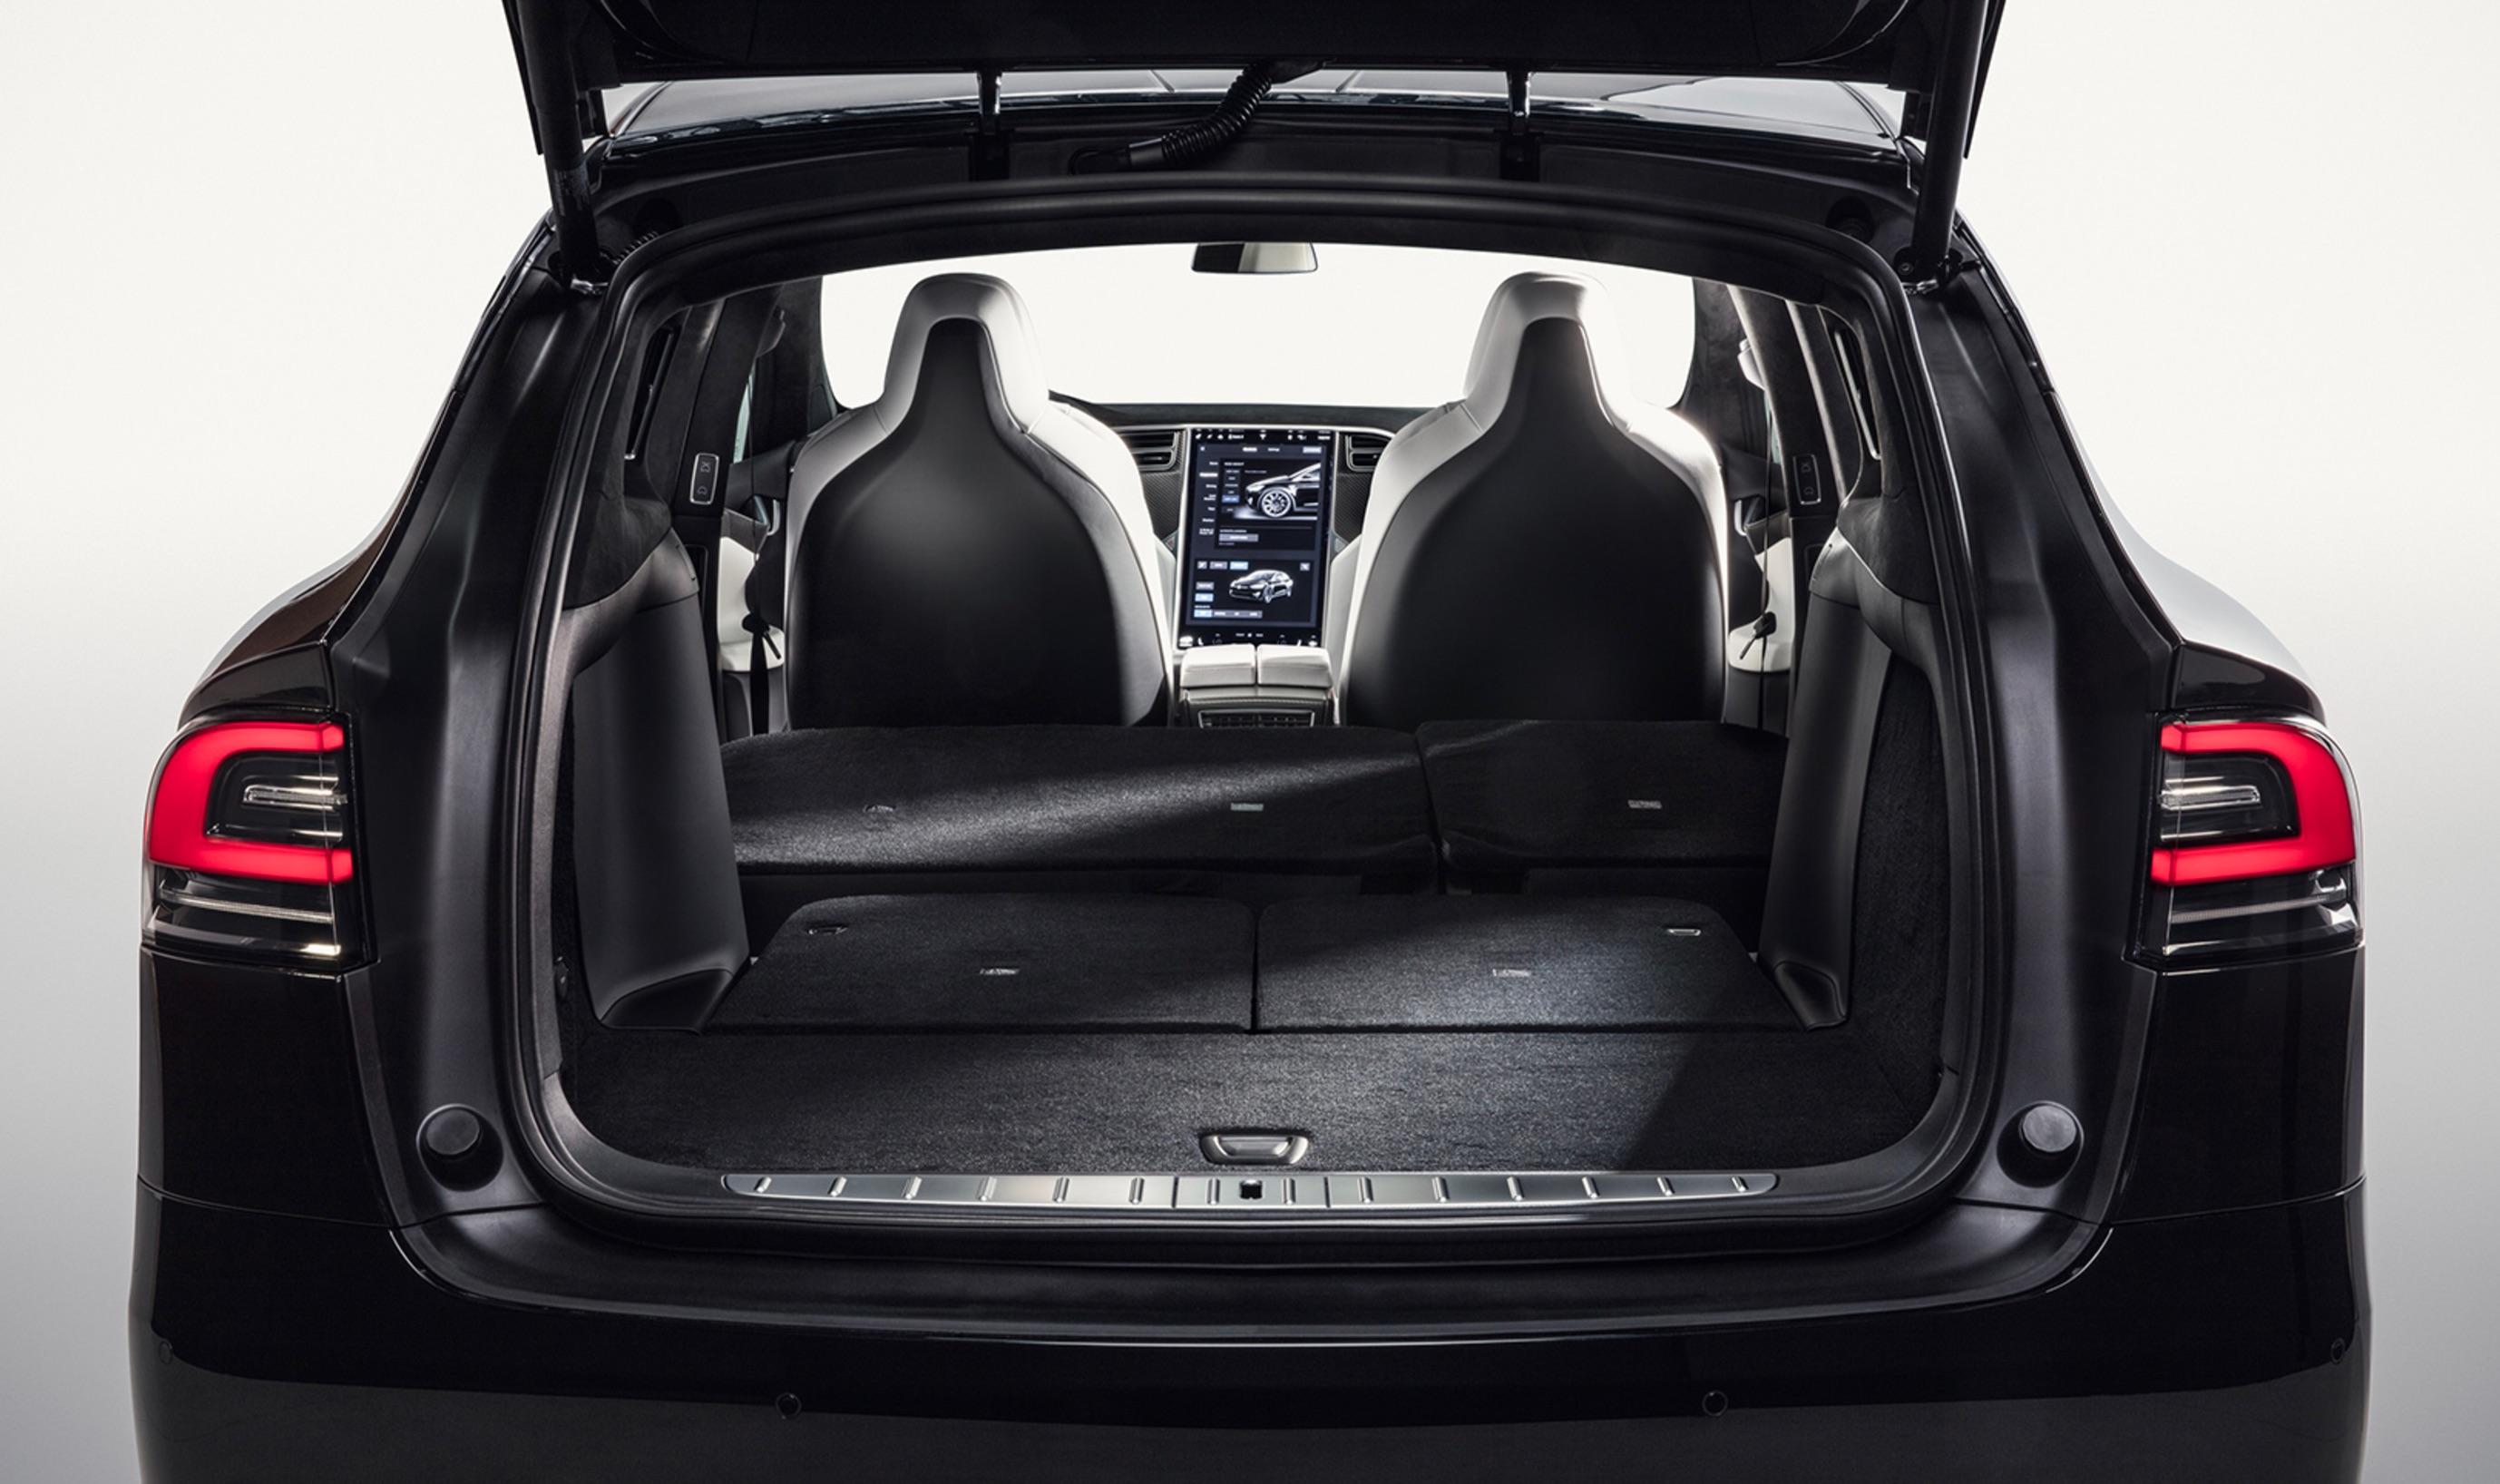 teszla-model-x-fold-down-7-seats